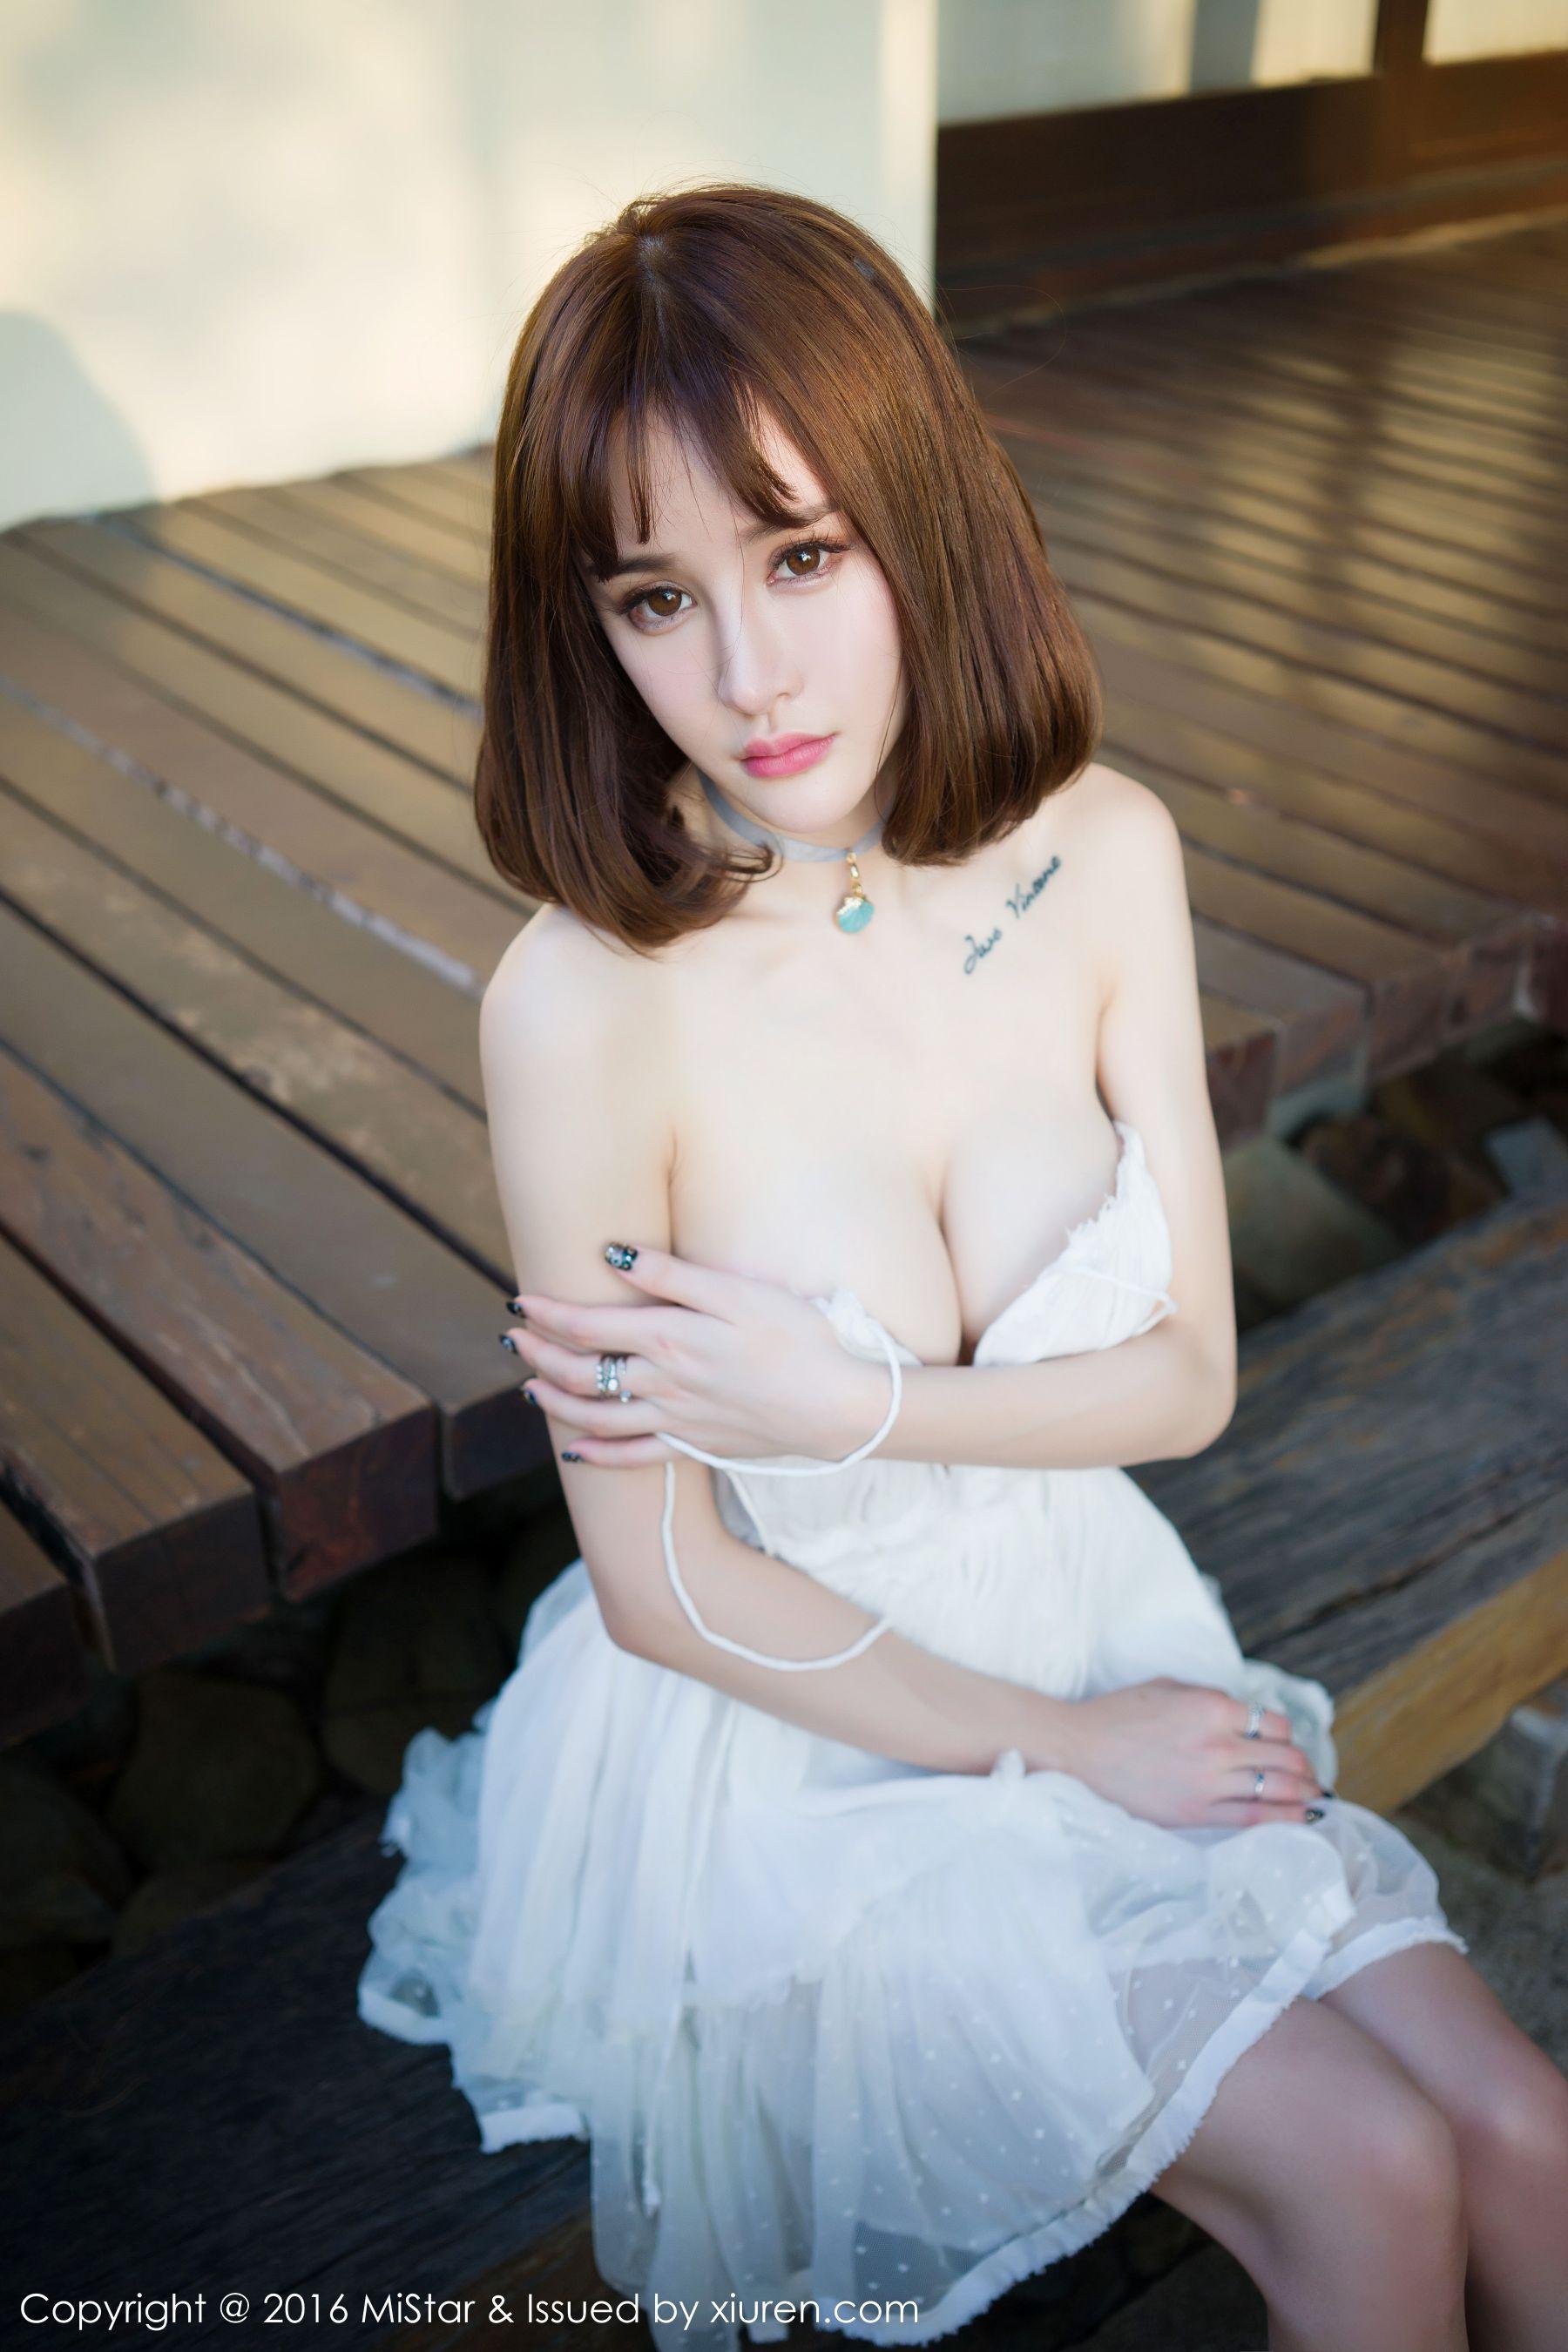 VOL.786 [魅妍社]蕾丝极品清新外拍正妹:Cheryl青树(孙梦怡)超高清写真套图(45P)